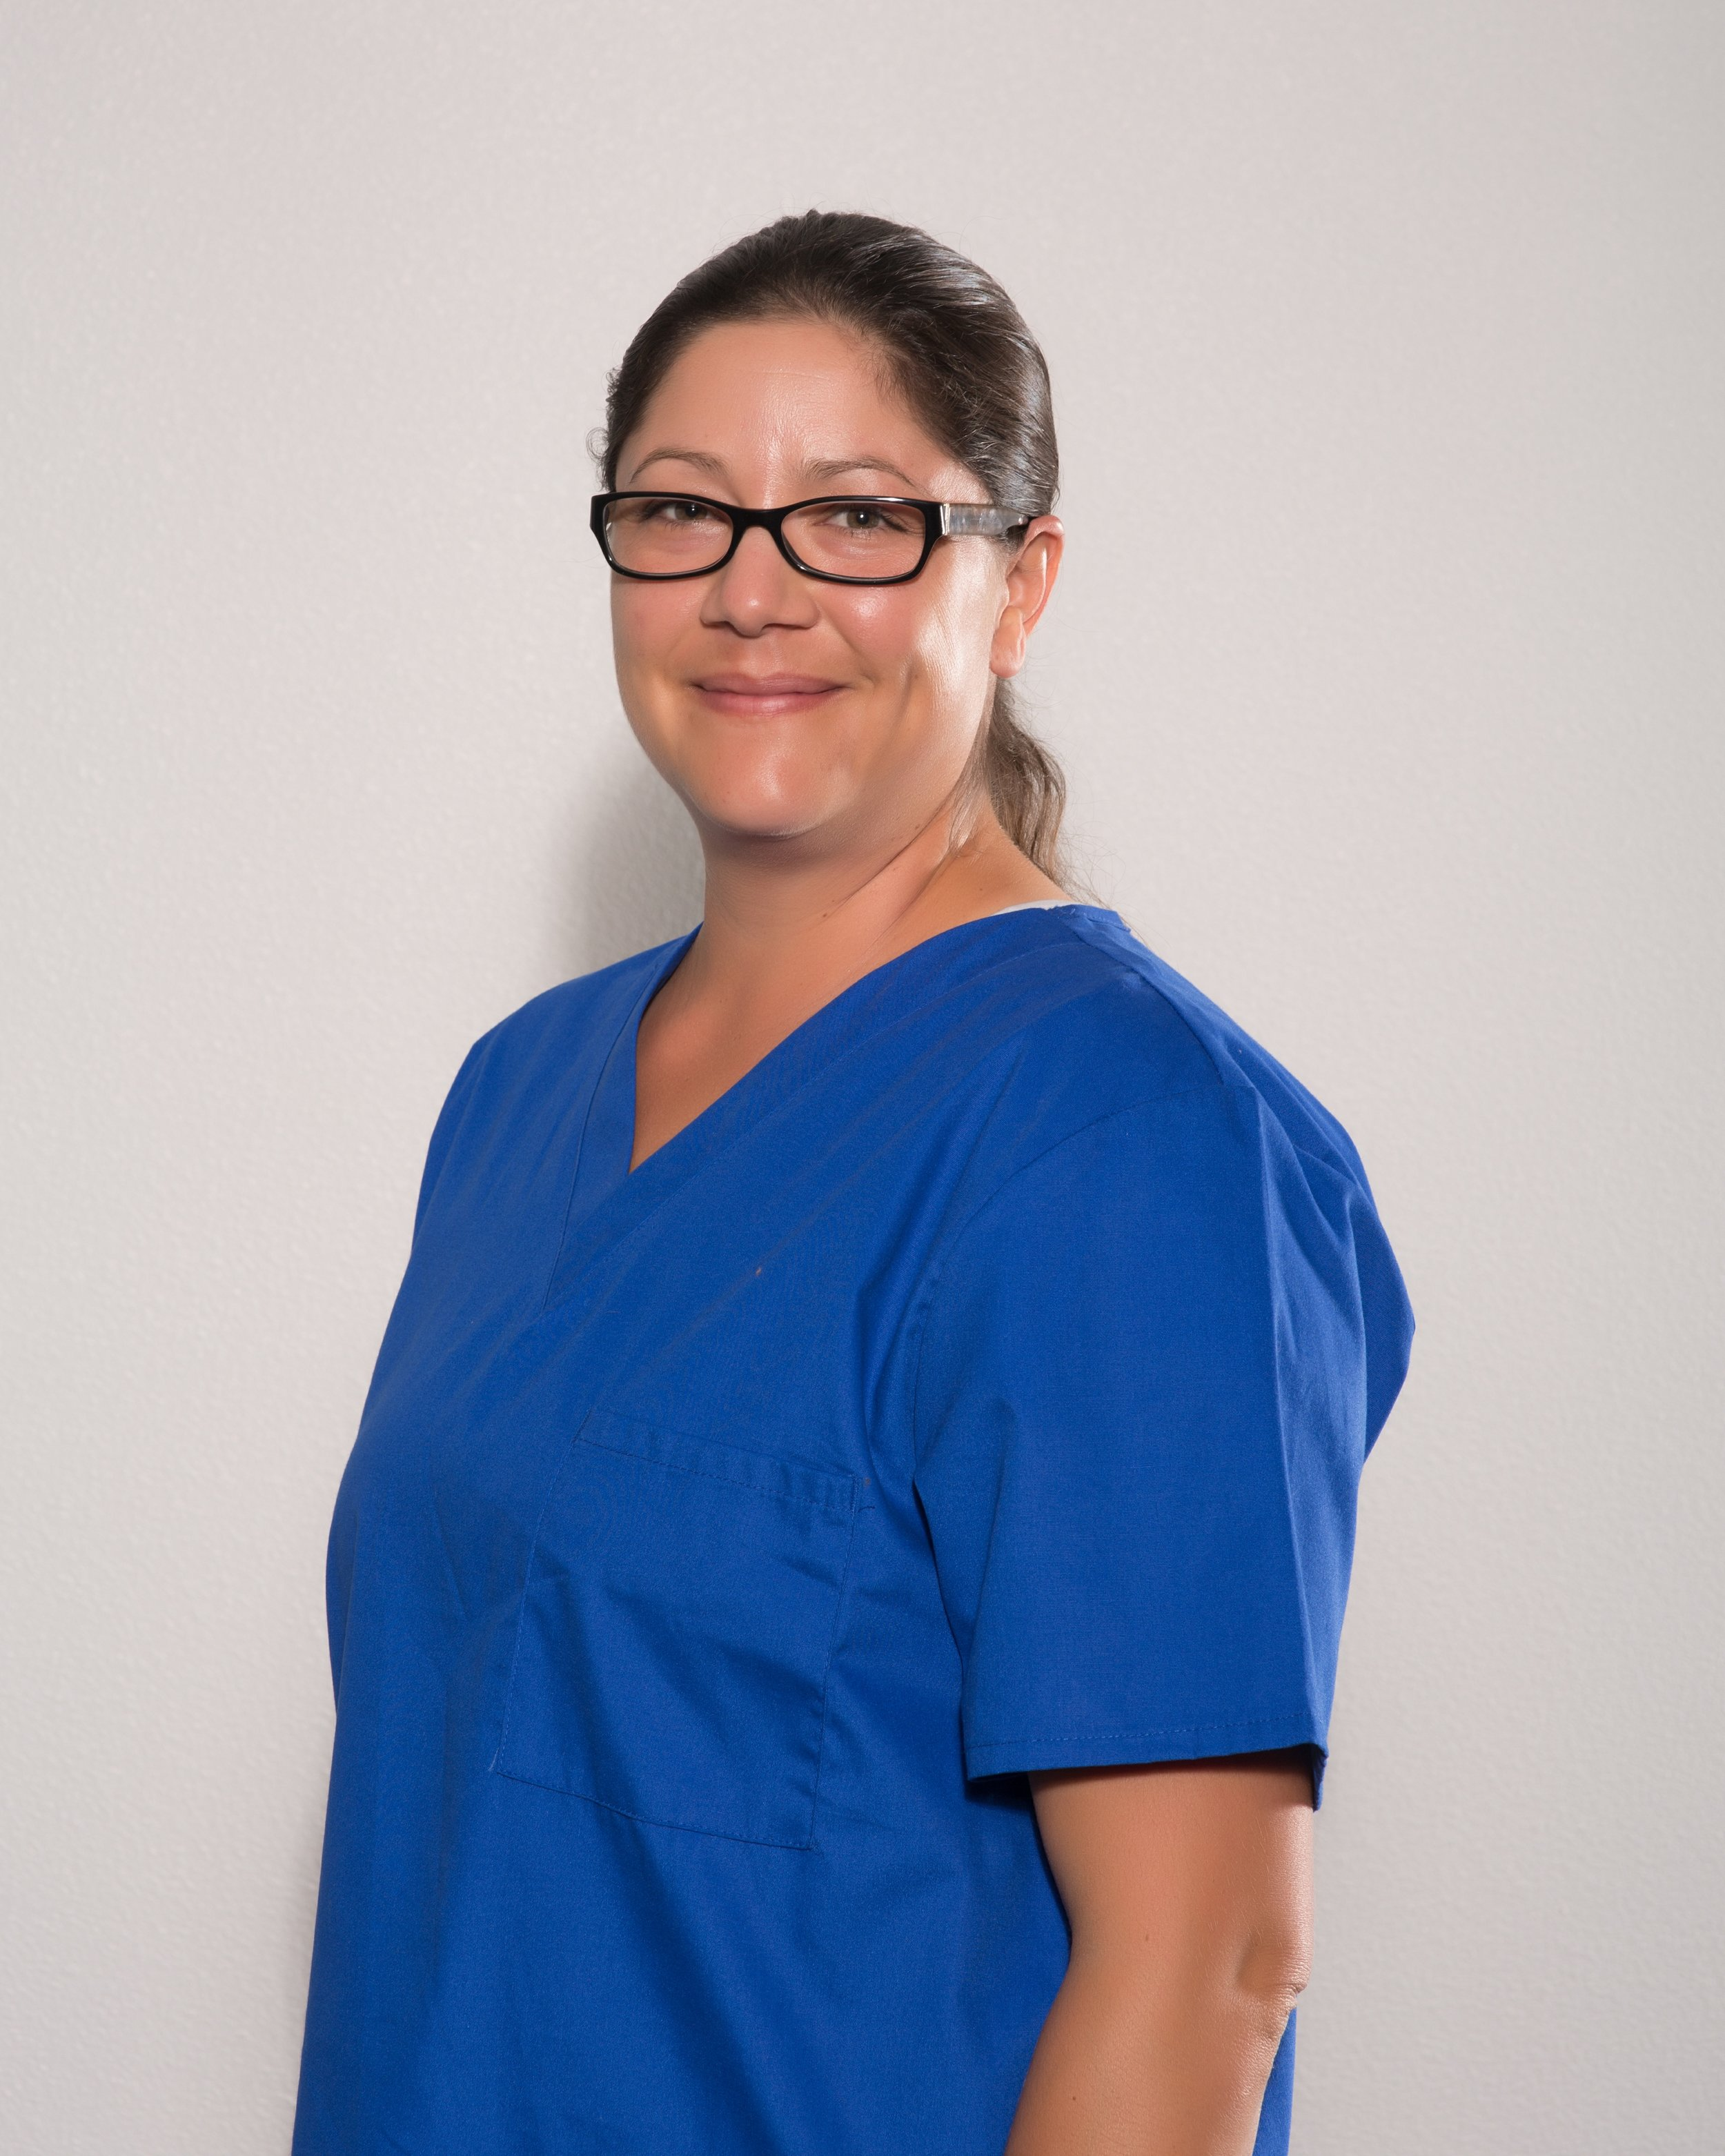 Sarah Porte  Occupational Therapist / MOT / OT / L